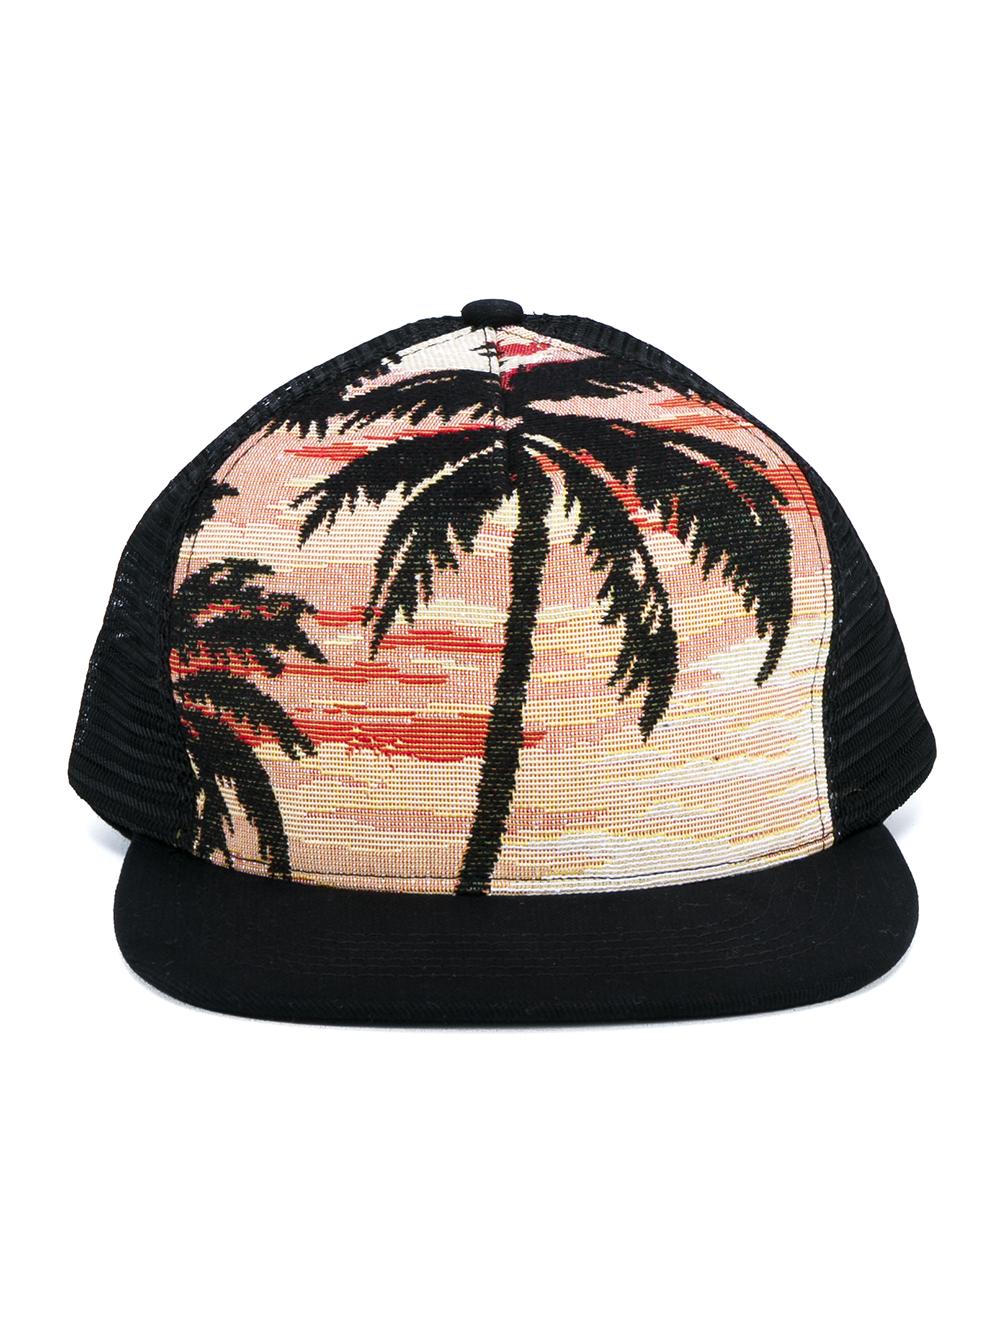 6e065741de5c51 Fresh Lyst - Saint Laurent Palm Tree Jacquard Trucker Hat in Orange for Men  OQ52